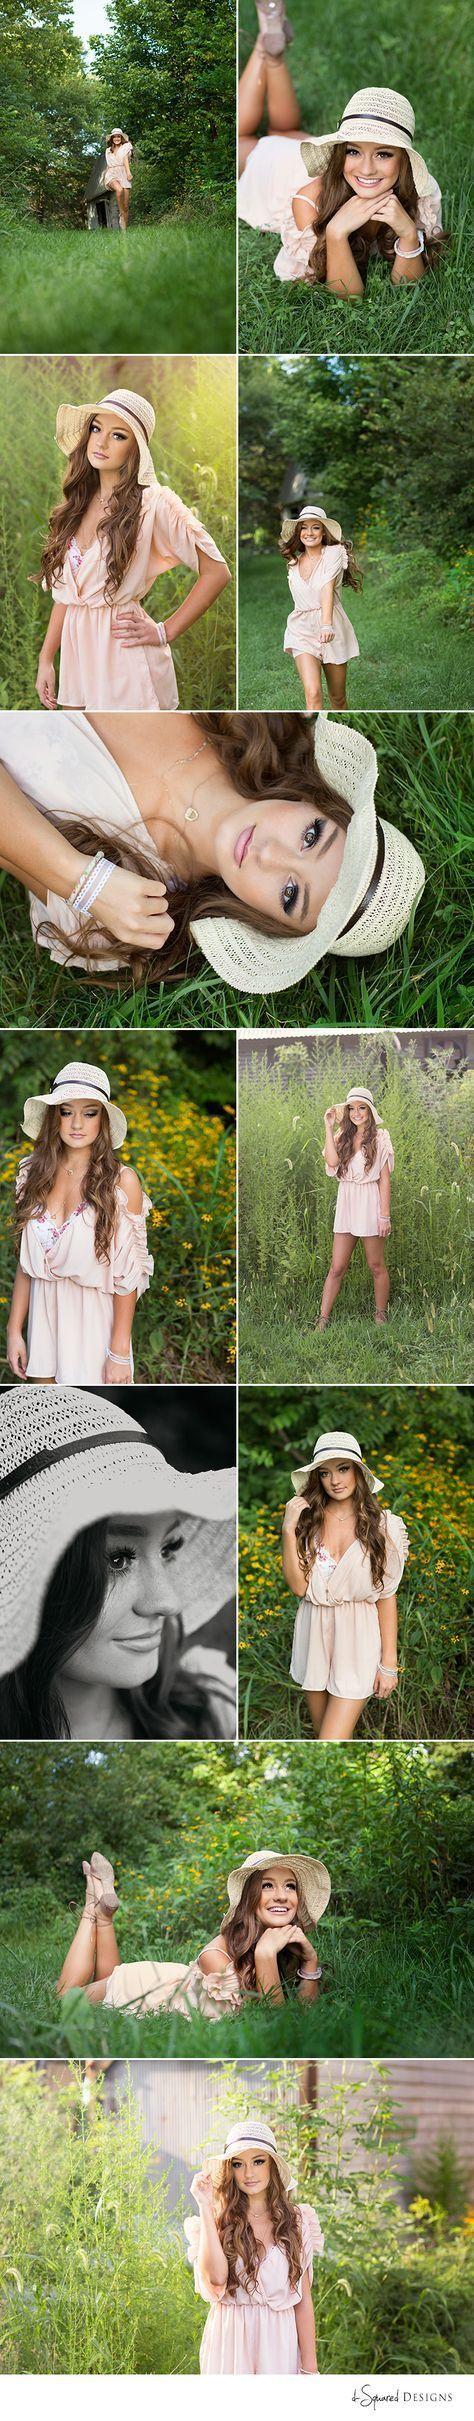 d-Squared Designs St. Louis, MO Senior Photography. Country girl senior. Gorgeous senior. Senior posing ideas. Romper and hat outfit. Summer senior girl.